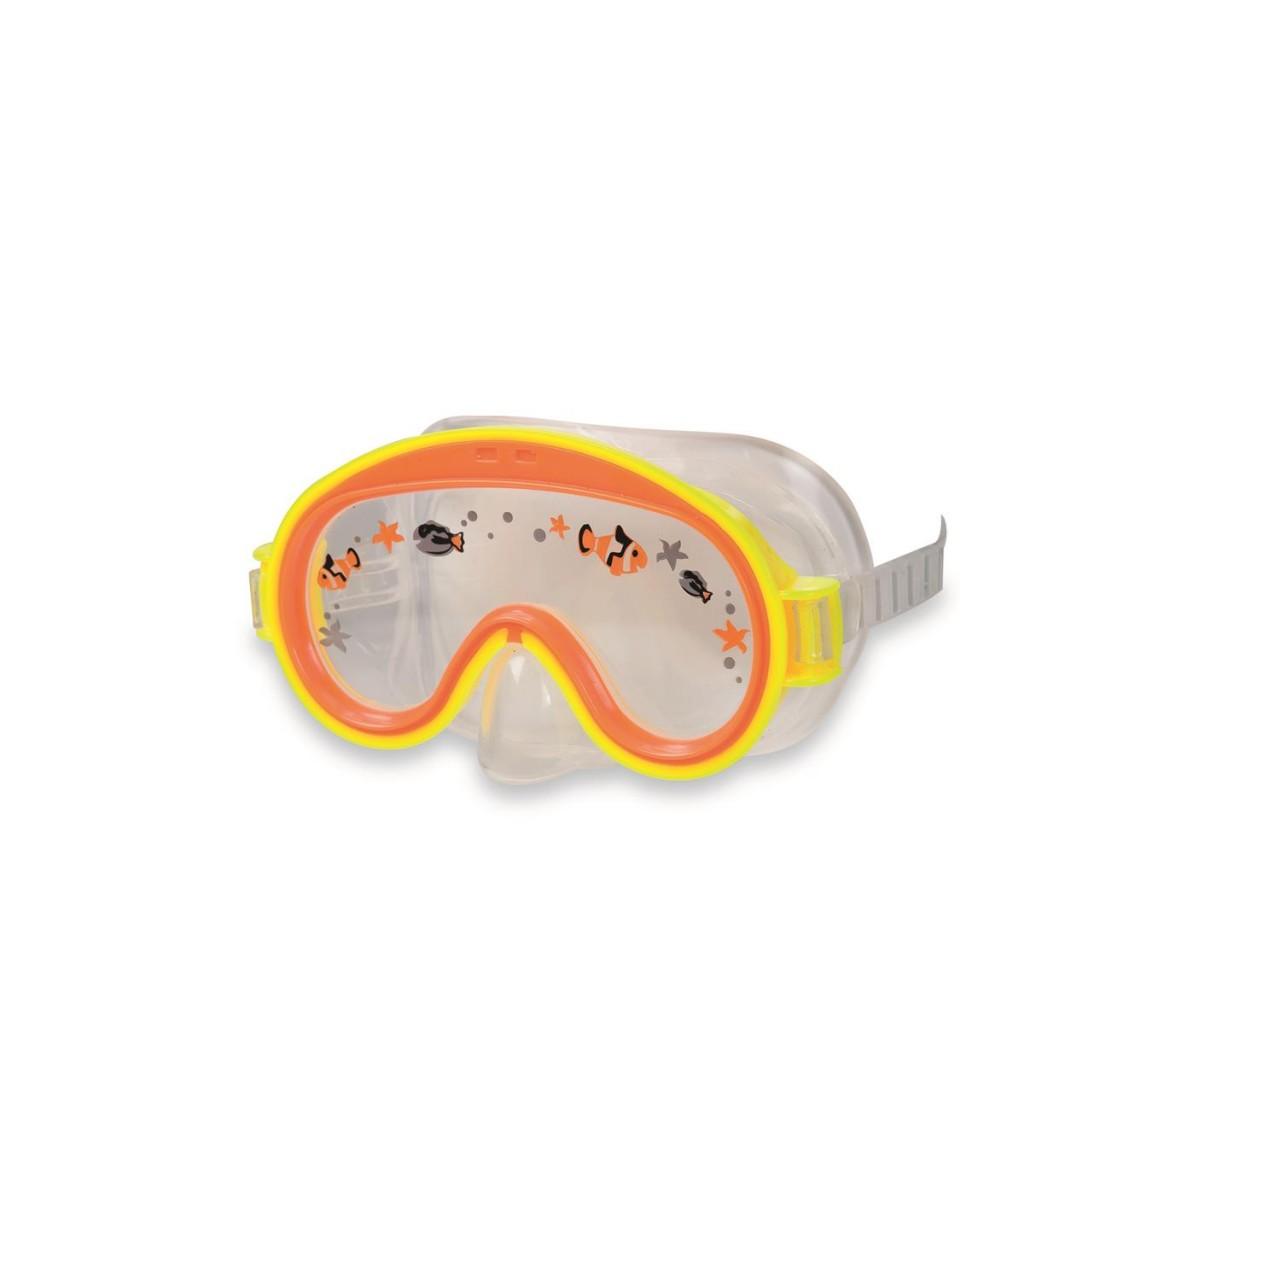 Intex Tauchermaske Brille Mini Aviator 3-10 Jahre Marke 55911